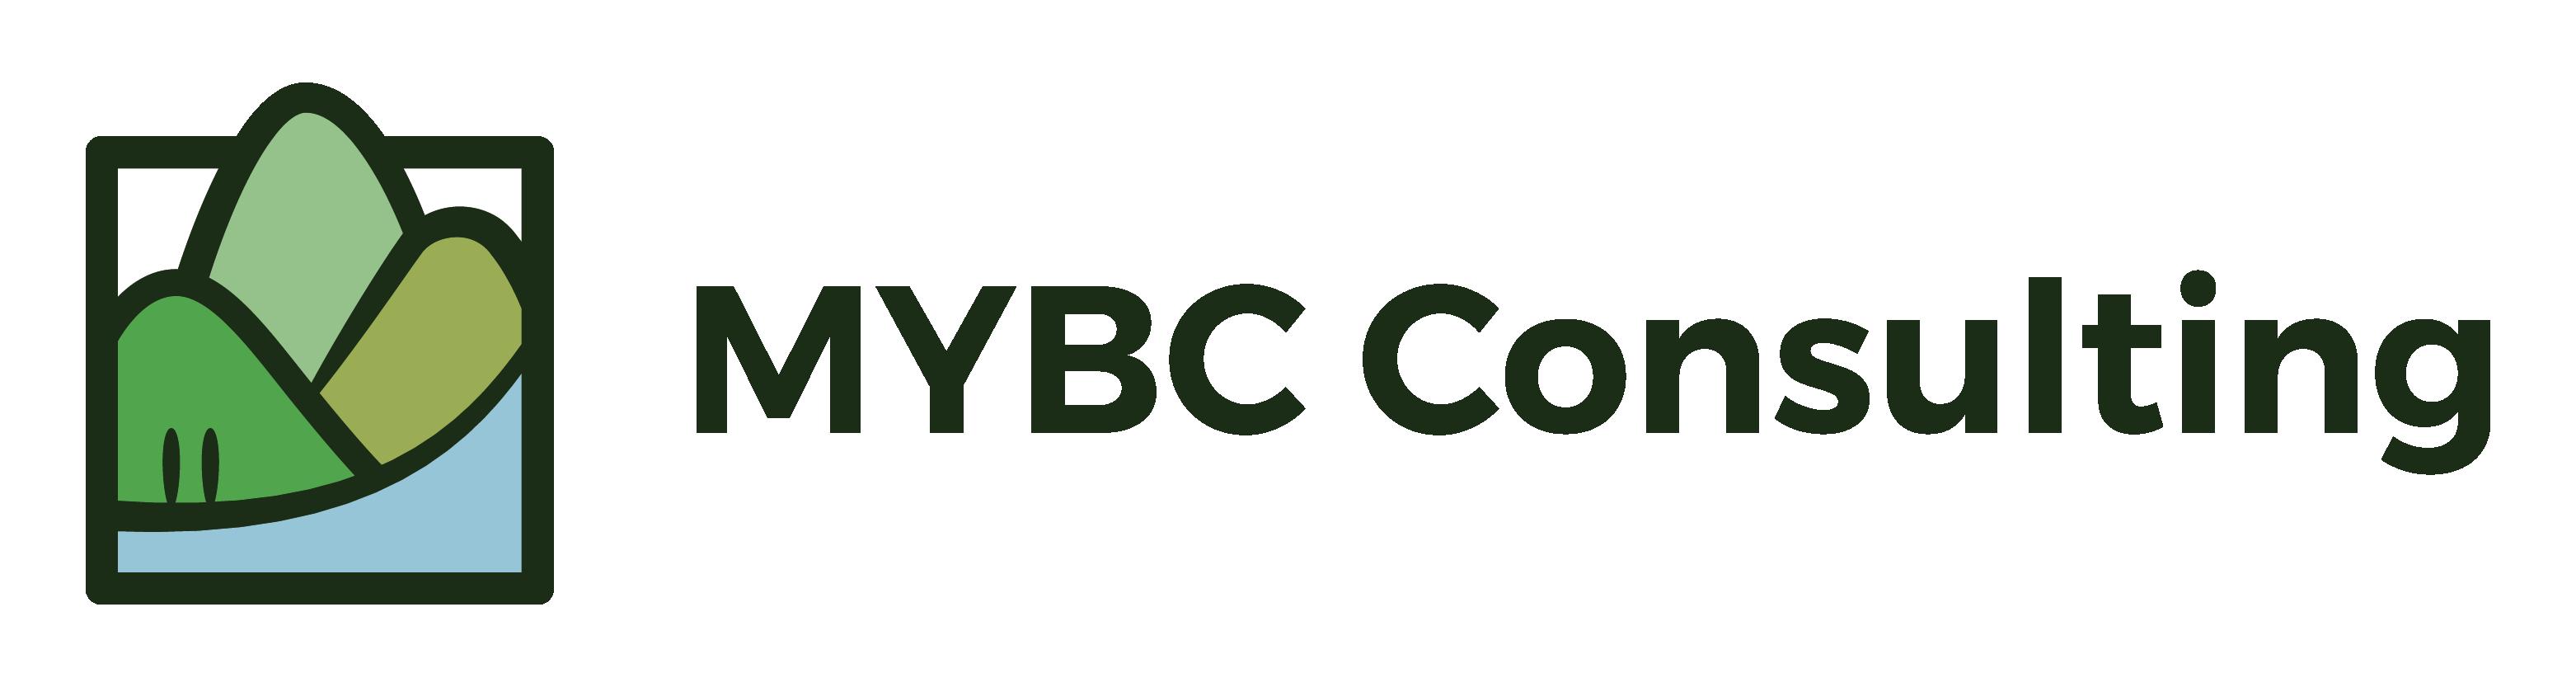 MYBC_Consulting